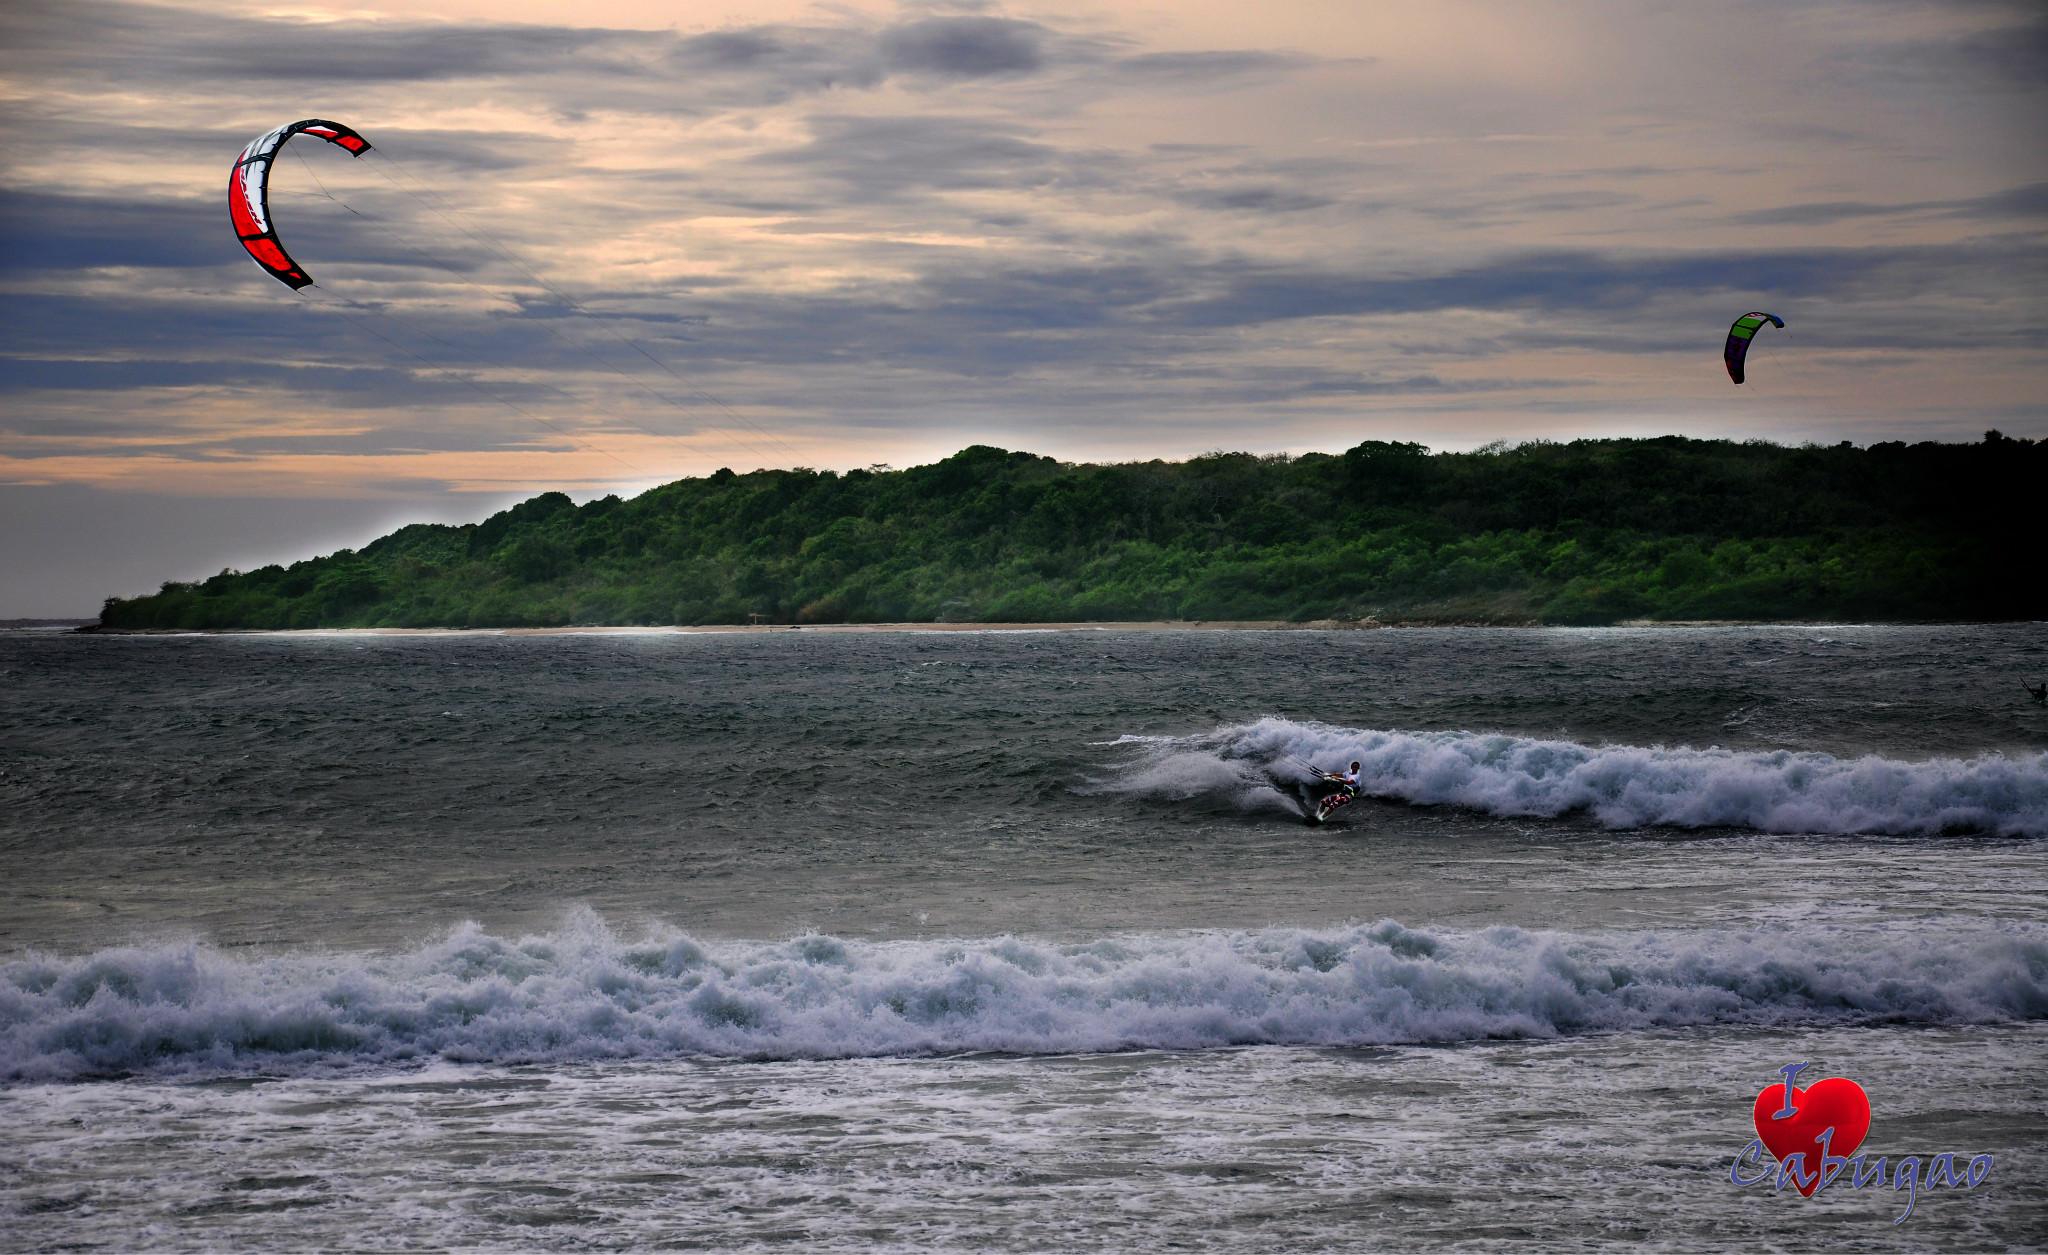 Photo: Kite Boarding at Barangay Sabang, Cabugao, Ilocos Sur AB Photography